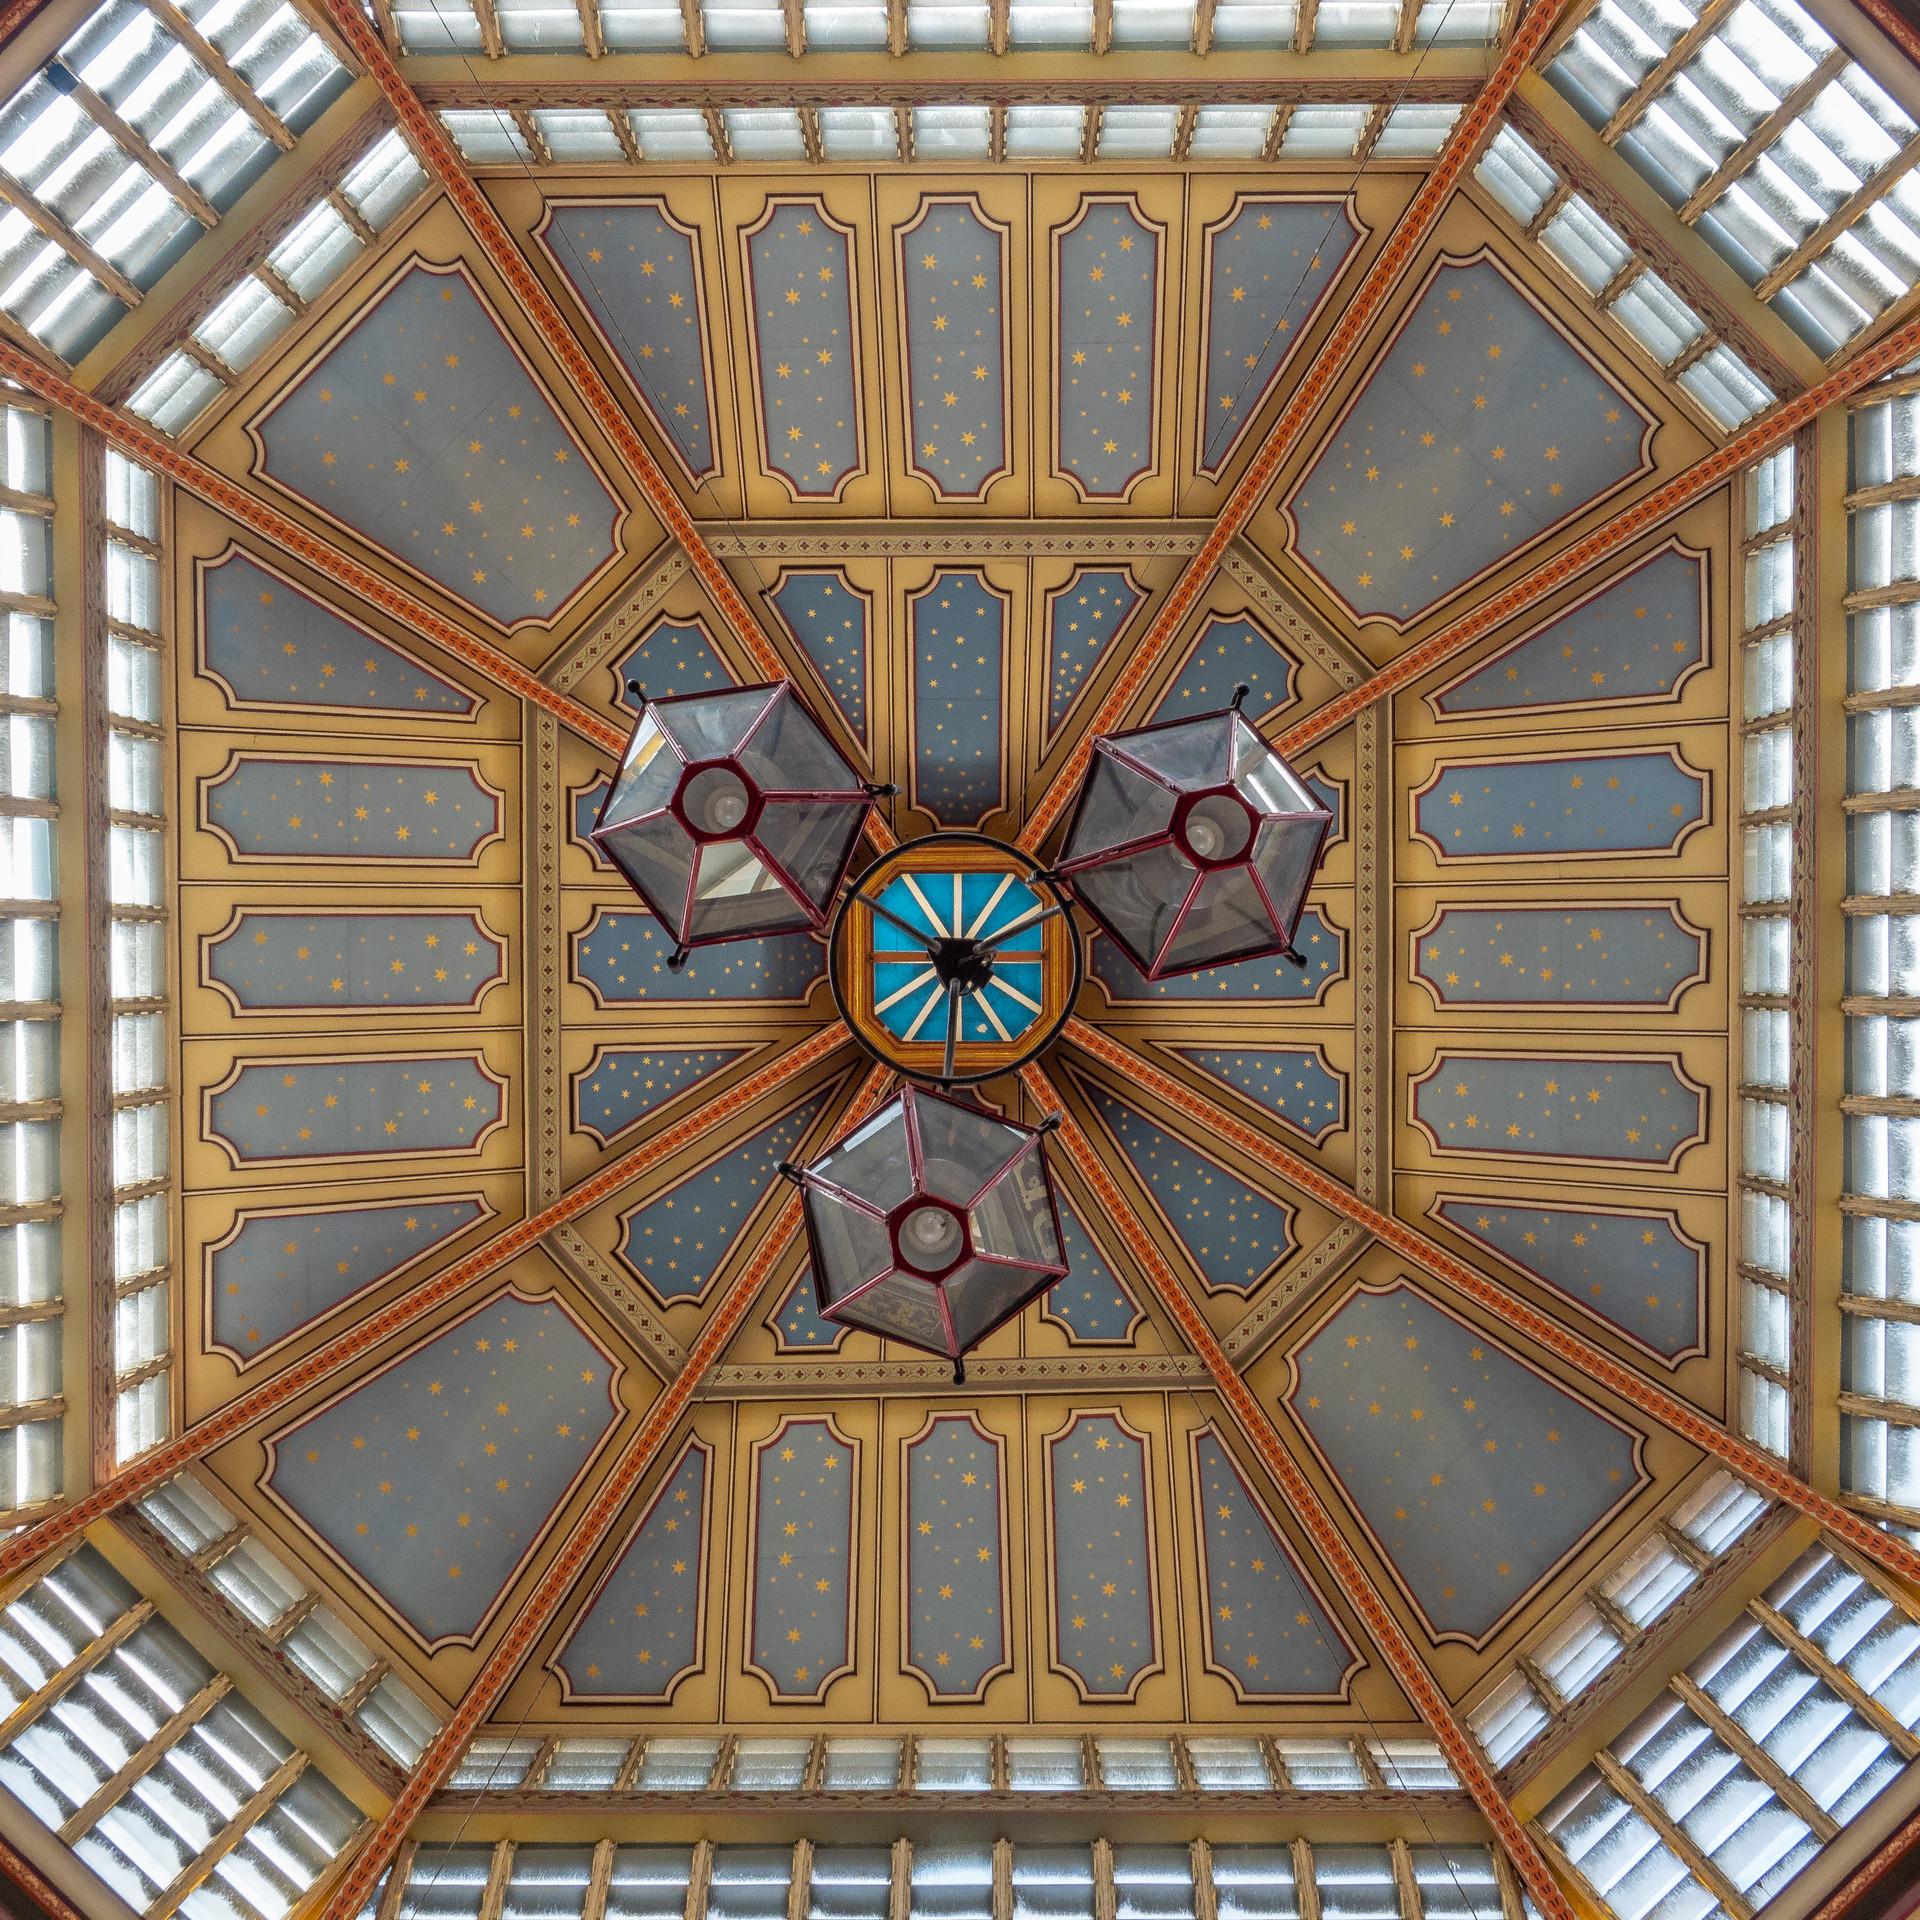 Ceiling at Leadenhall Market, London